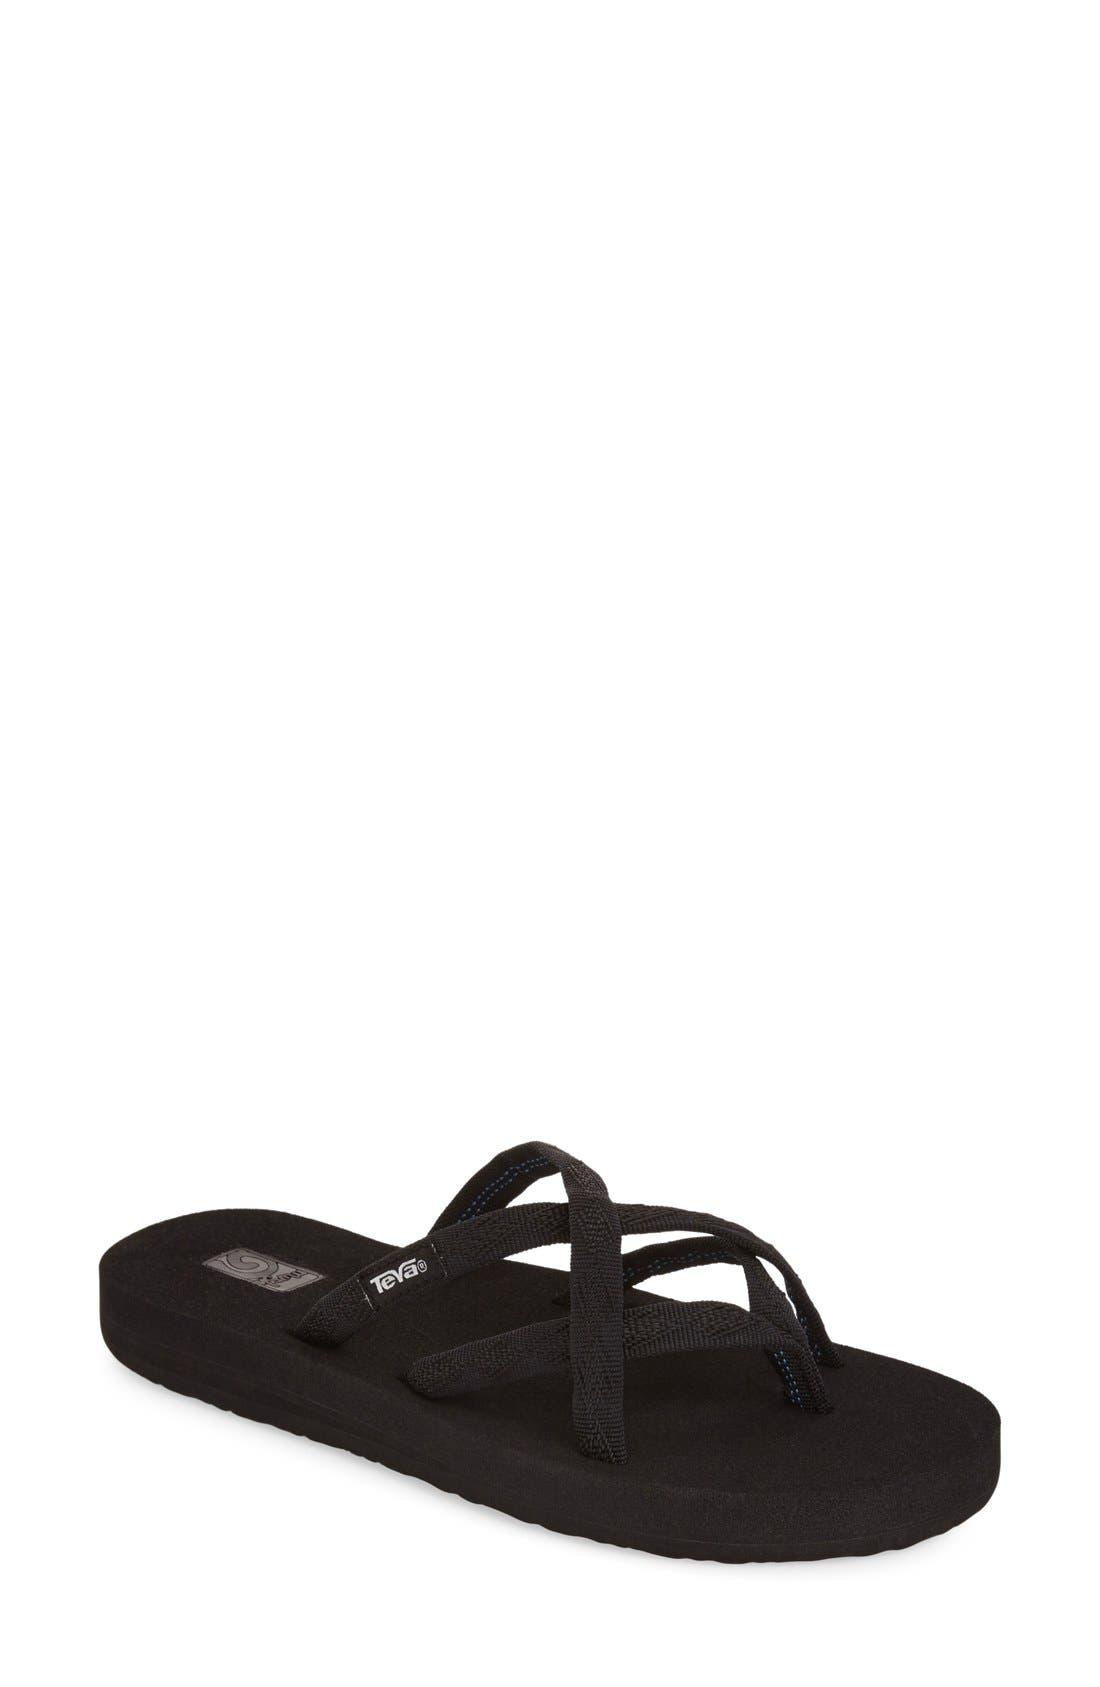 f11877606 Teva Sandals - Women s